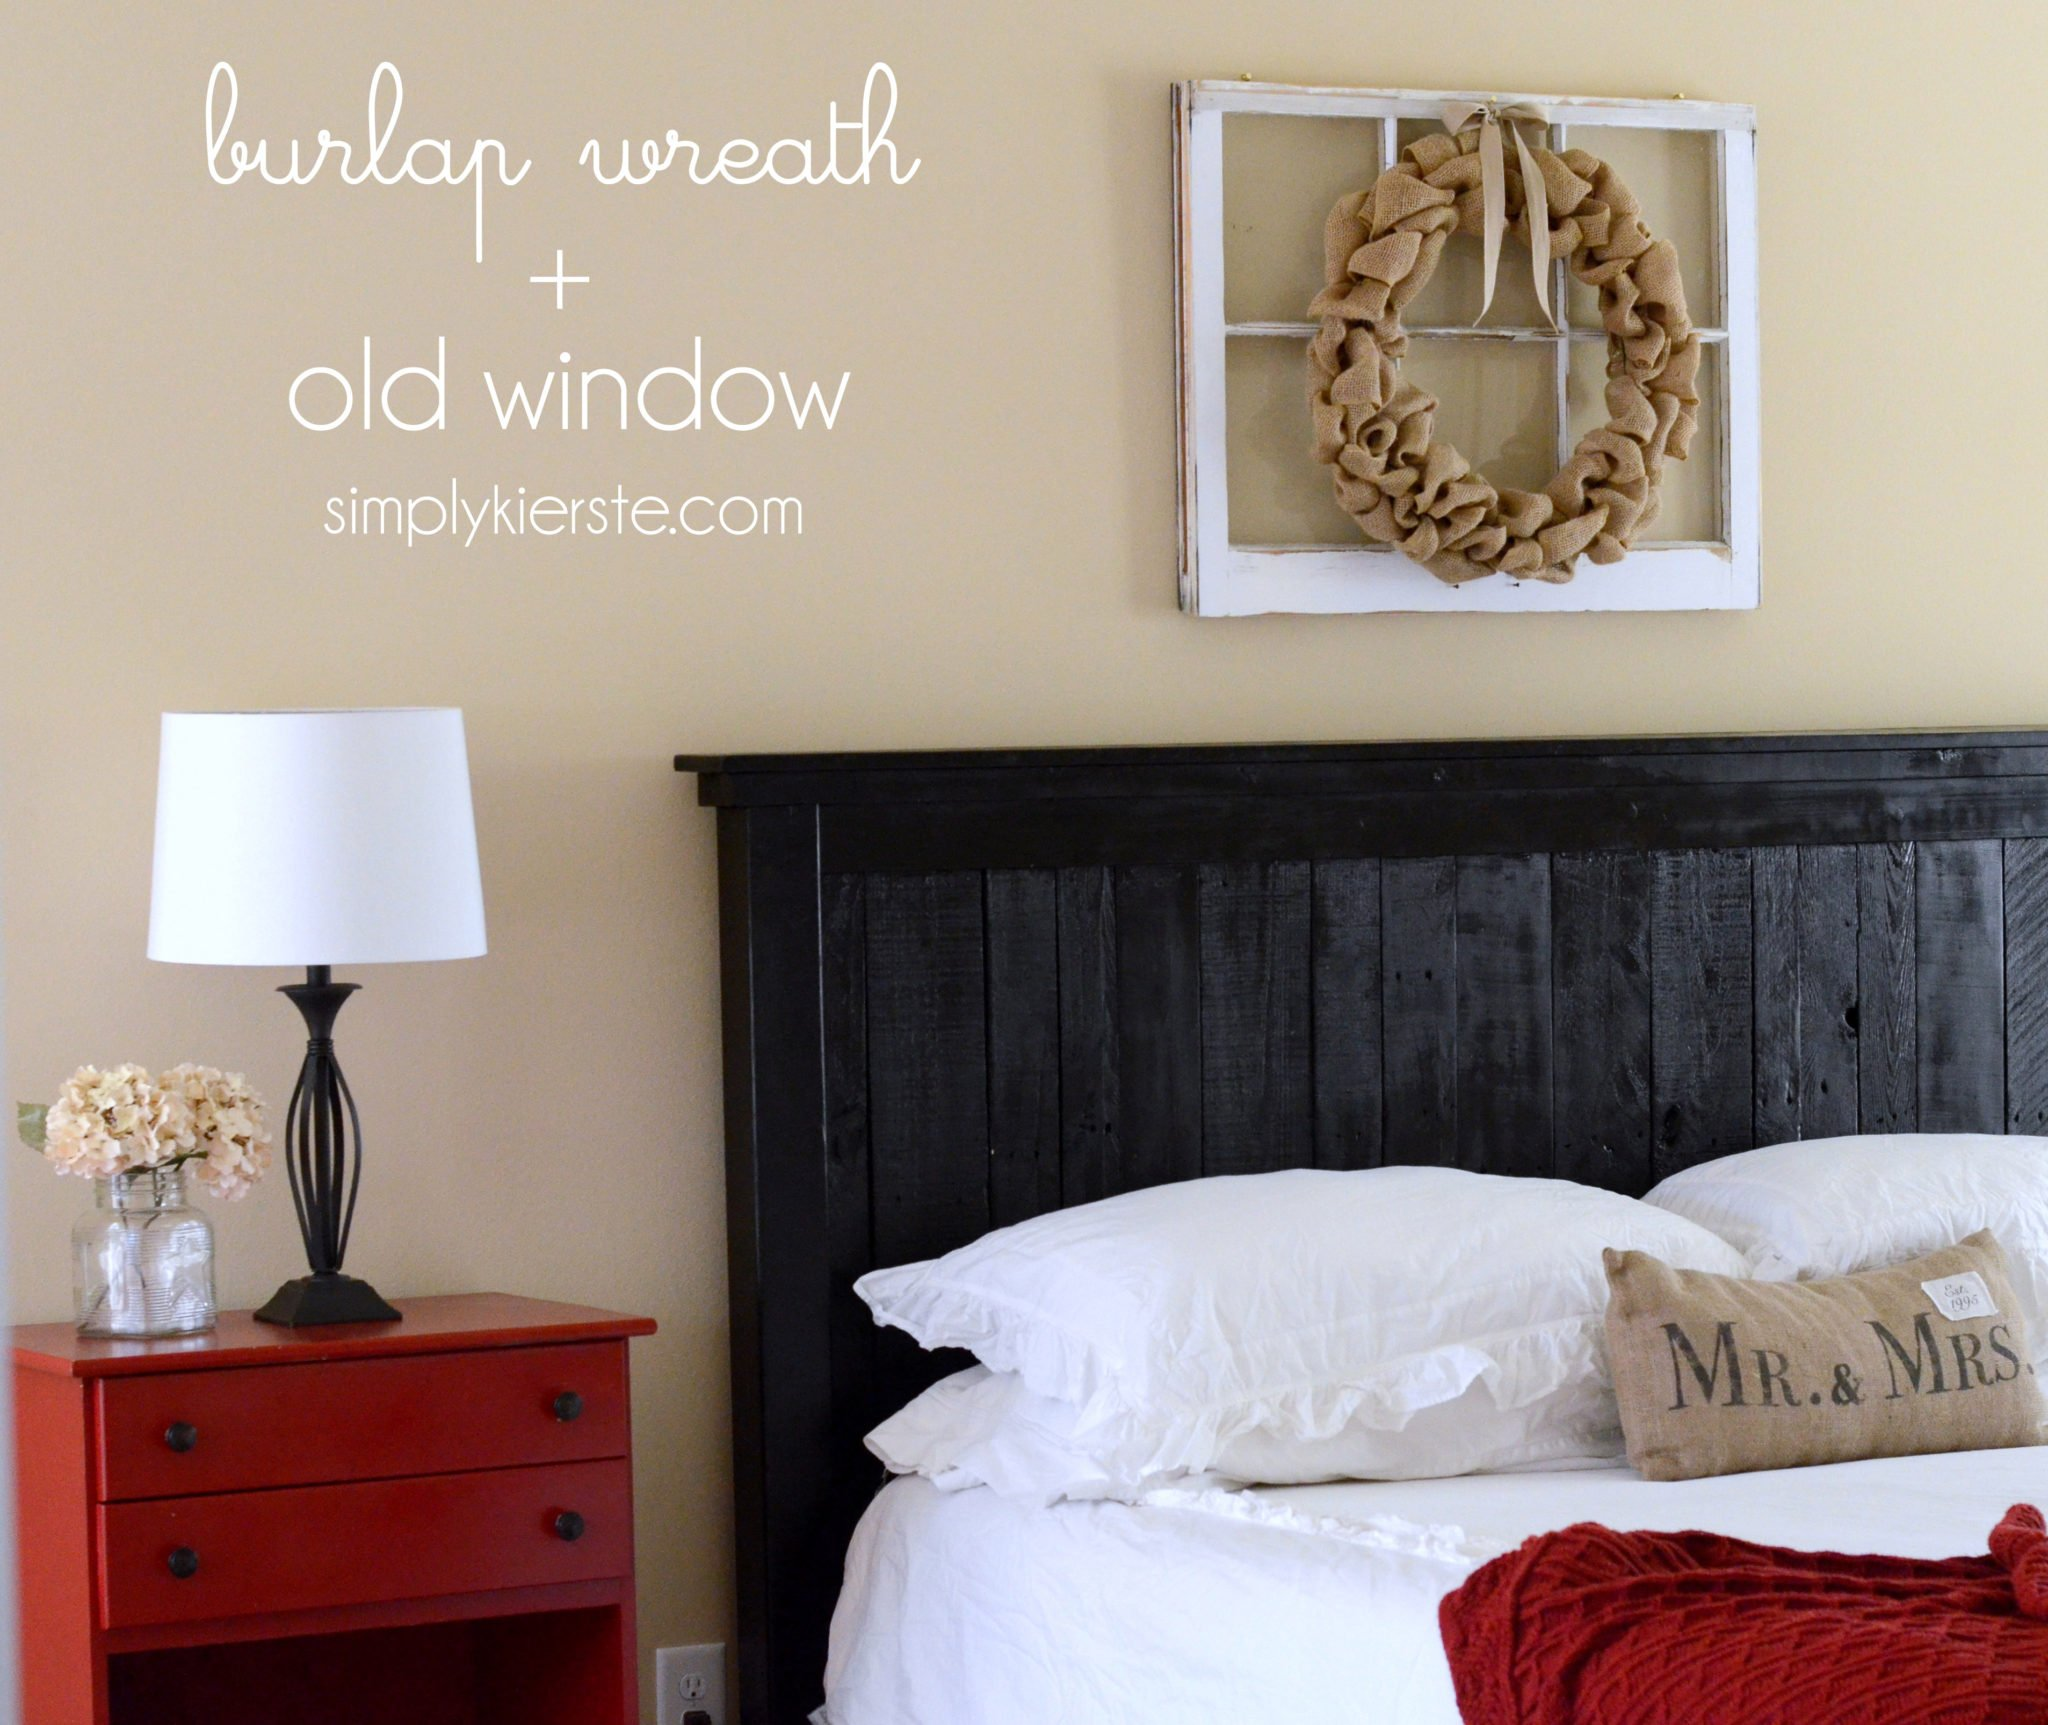 {burlap wreath + old window}